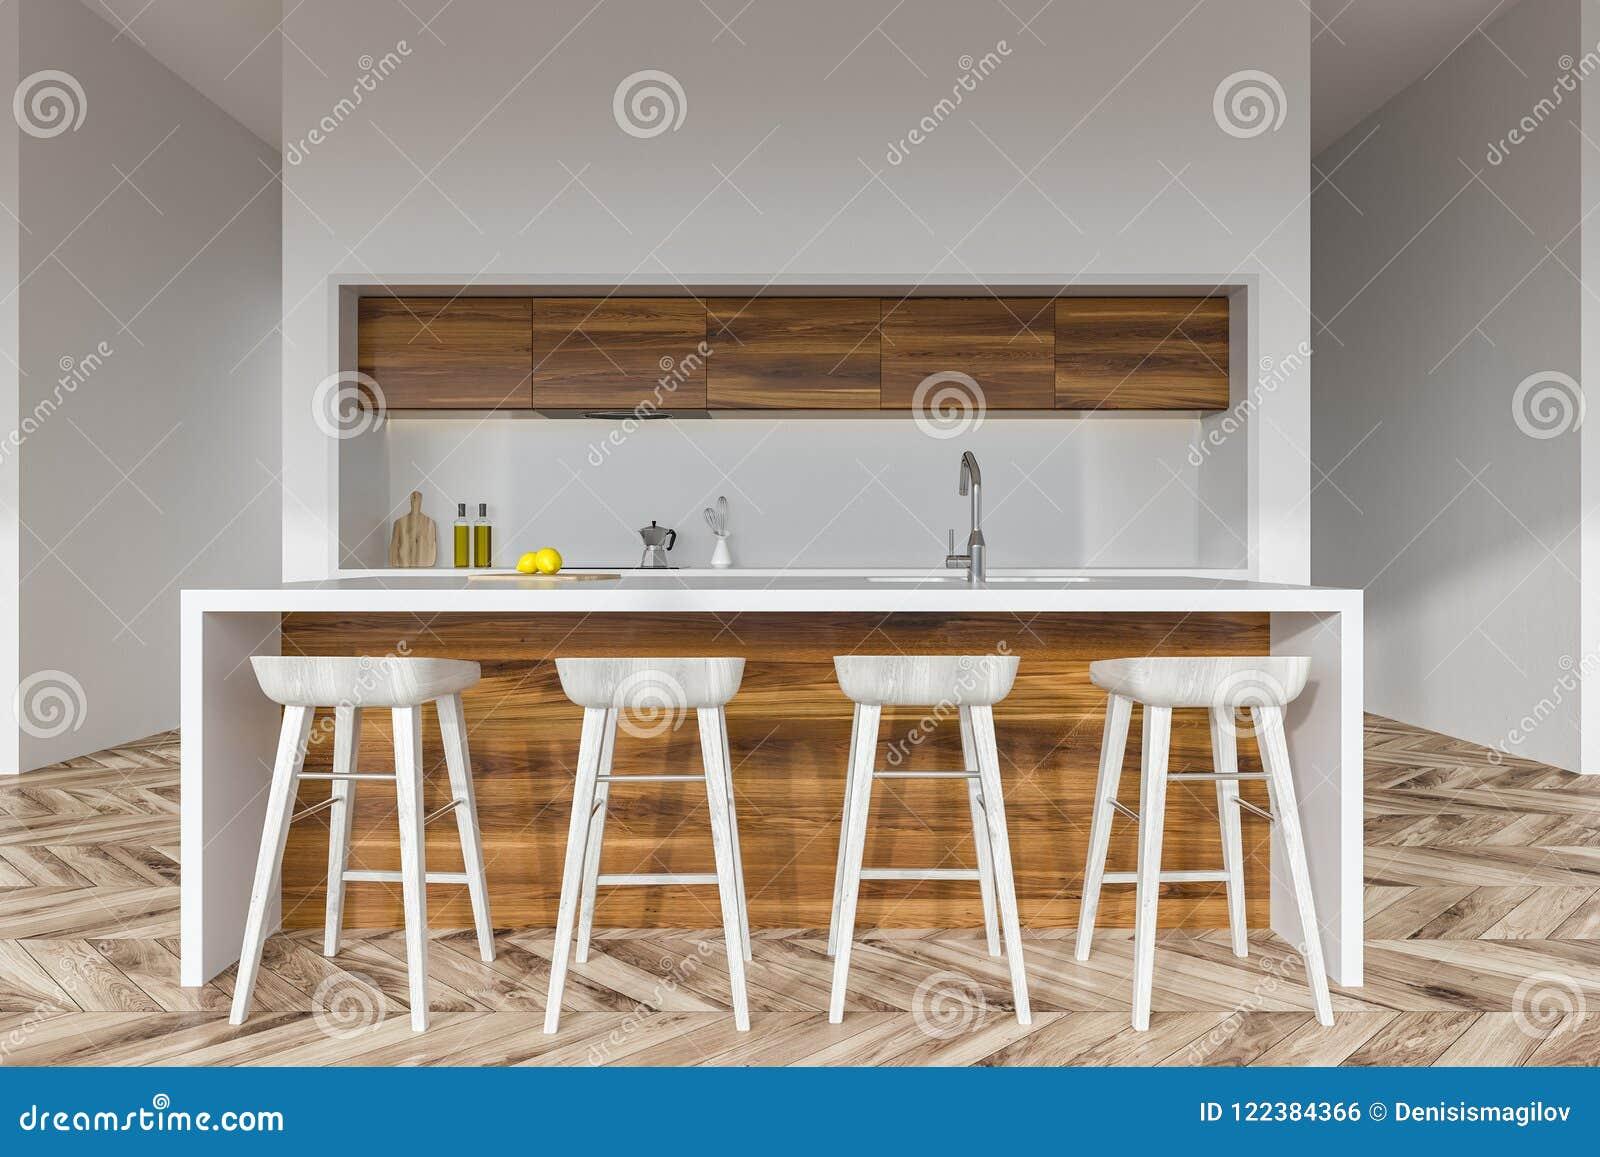 Wooden Kitchen Bar With Stools Stock Illustration